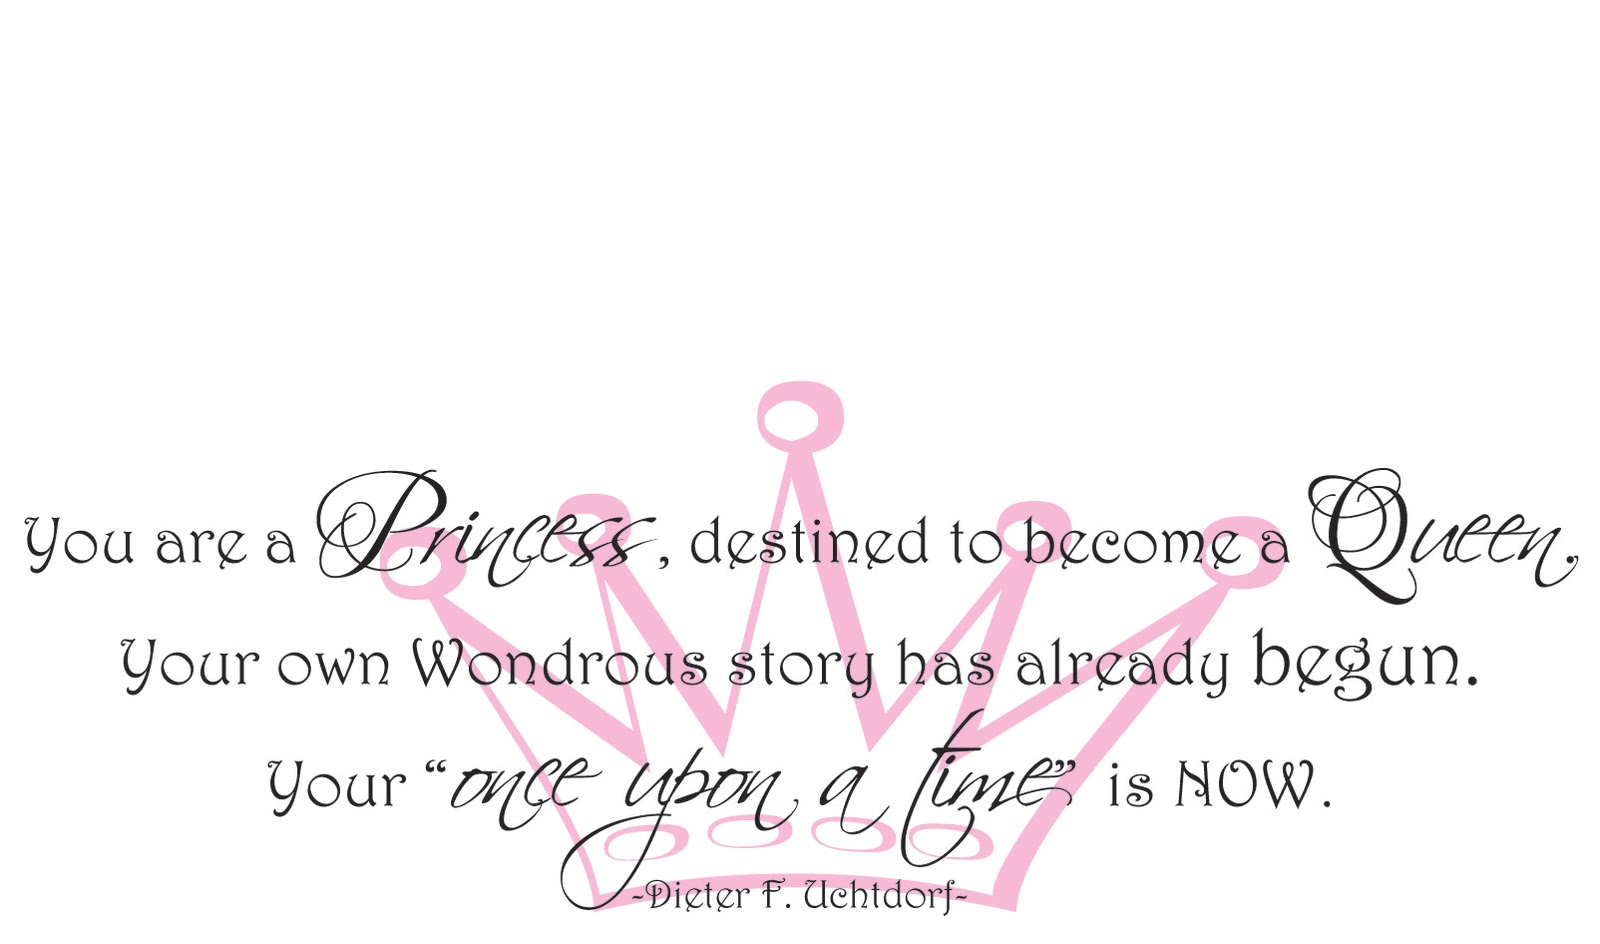 Girlfriend Princess Quote : A little princess quotes quotesgram